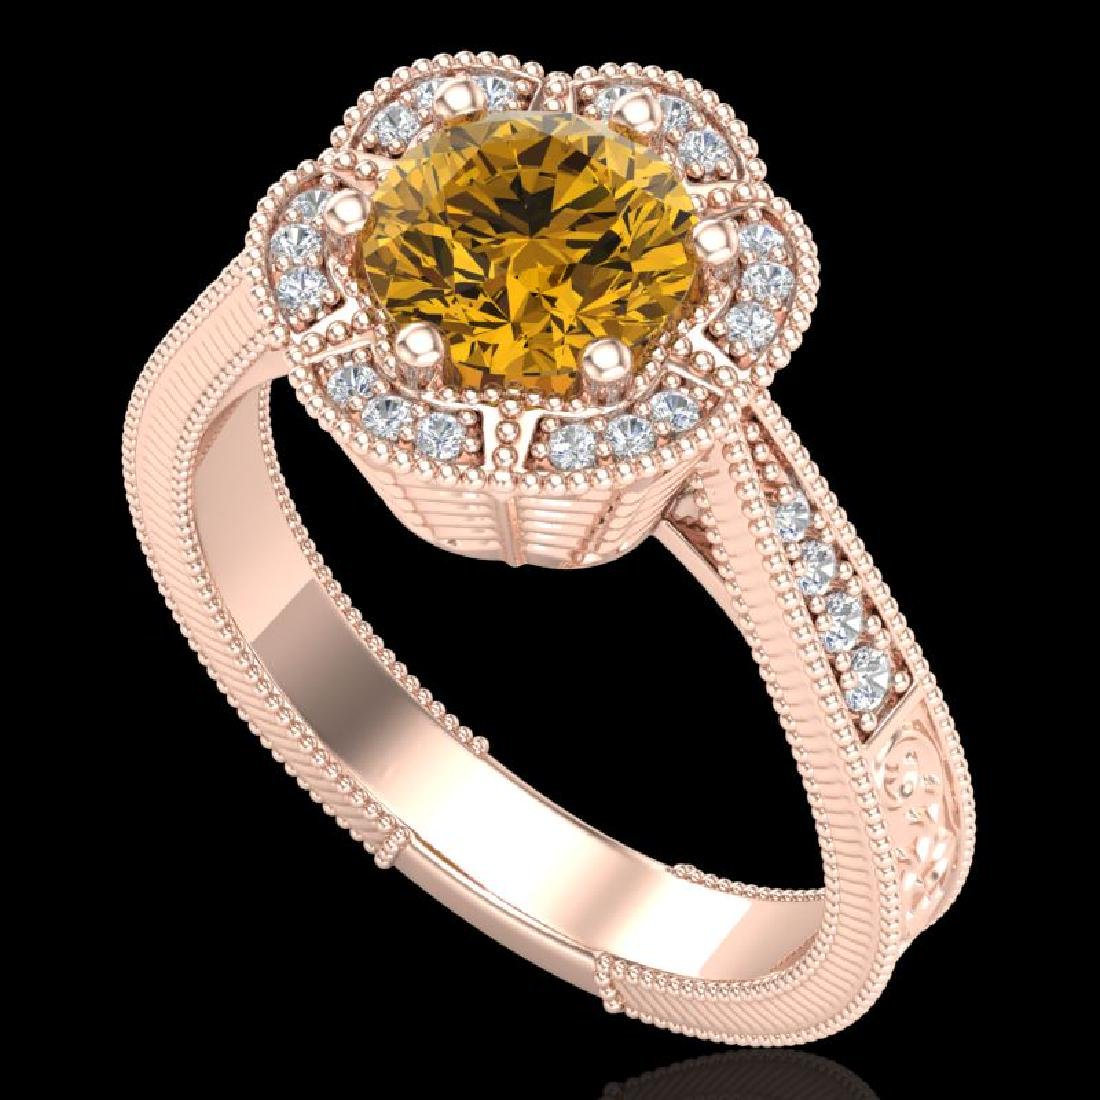 1.33 CTW Intense Fancy Yellow Diamond Engagement Art